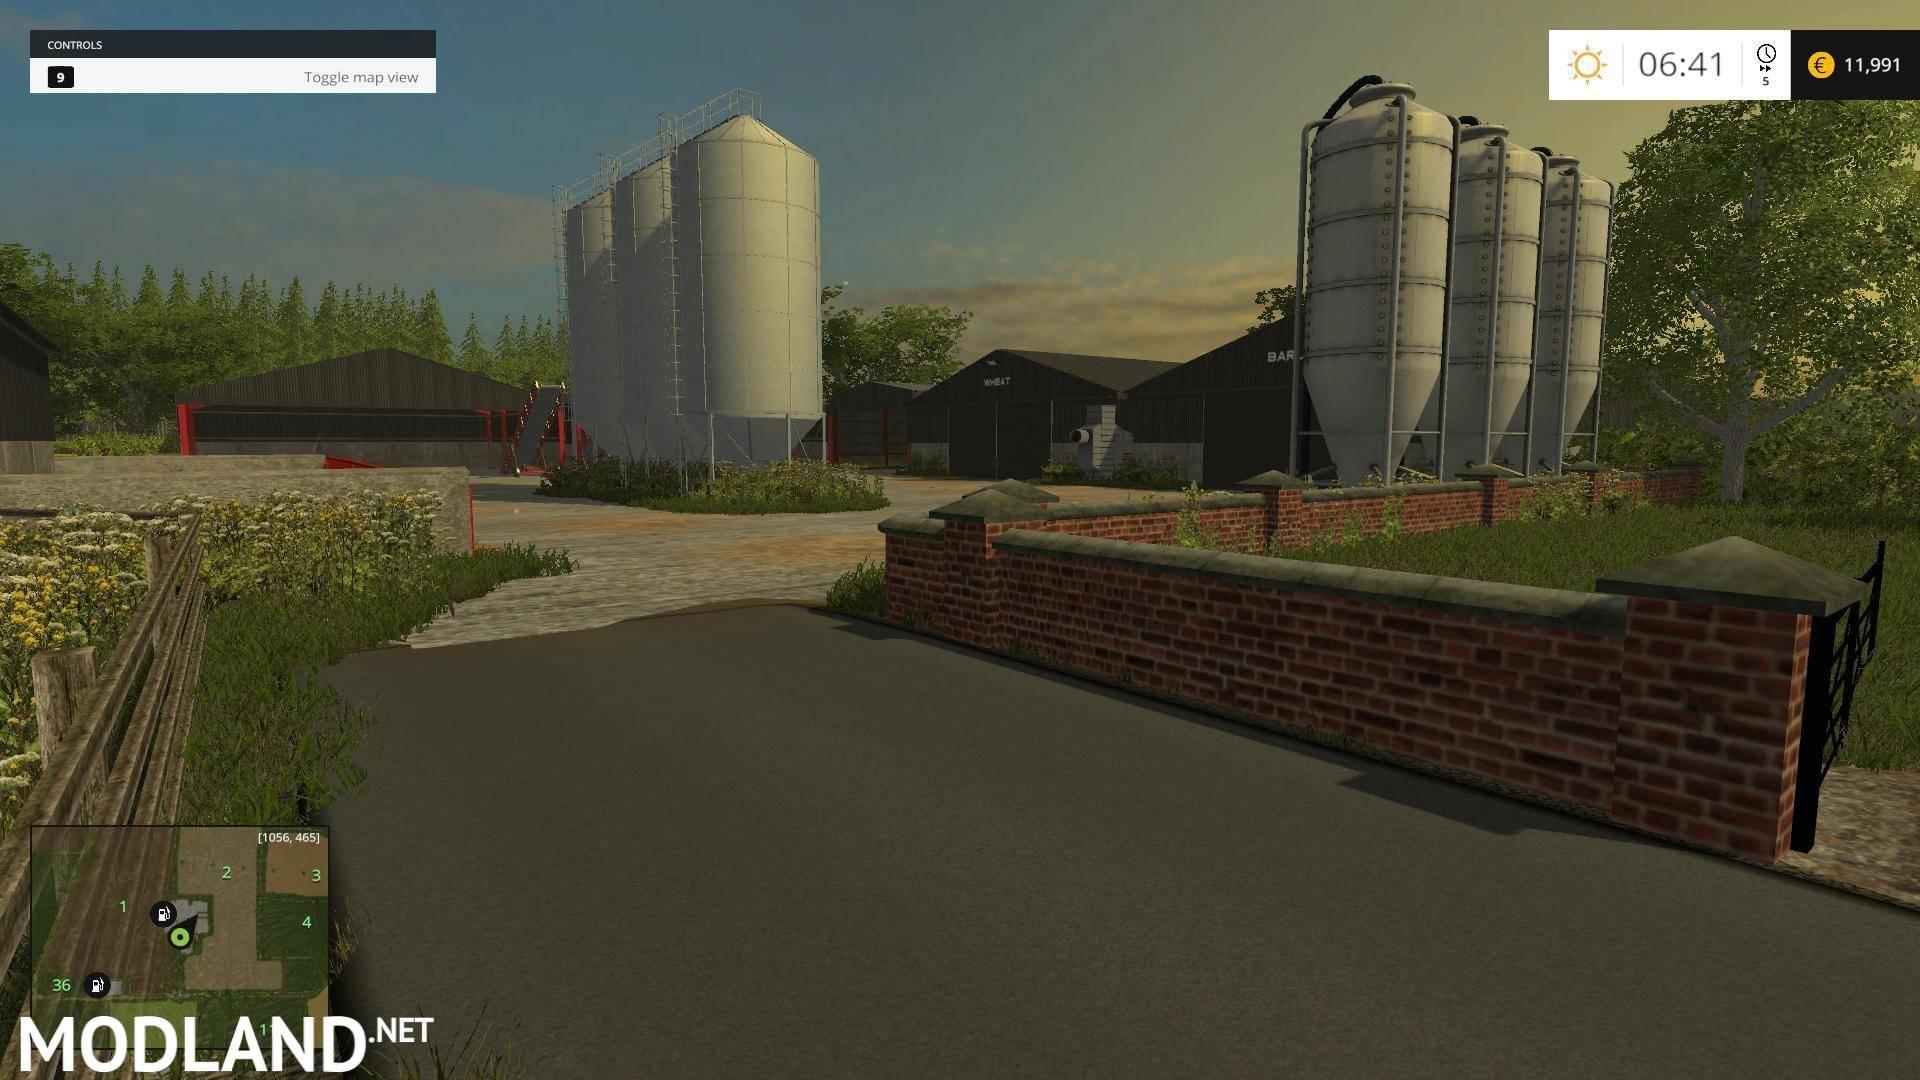 Orchard Farm Map v 1 0 mod for Farming Simulator 2015 / 15